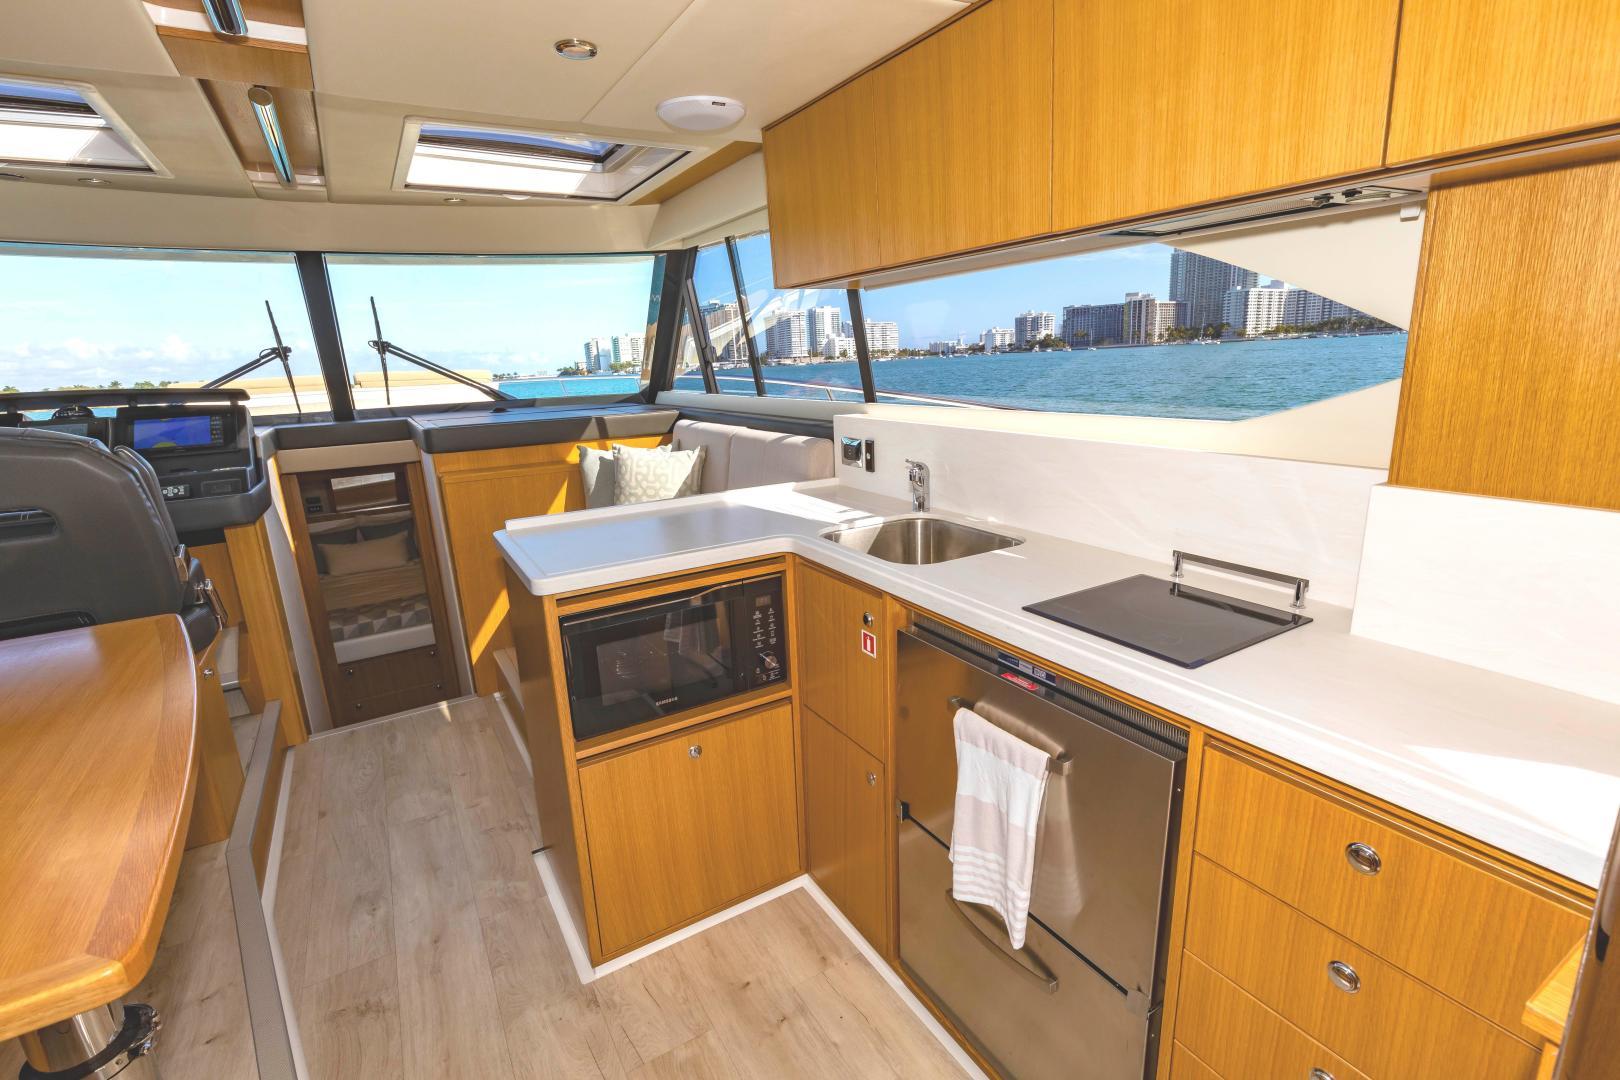 Riviera-395 SUV 2019-Ipanema Miami Beach-Florida-United States-1614900   Thumbnail